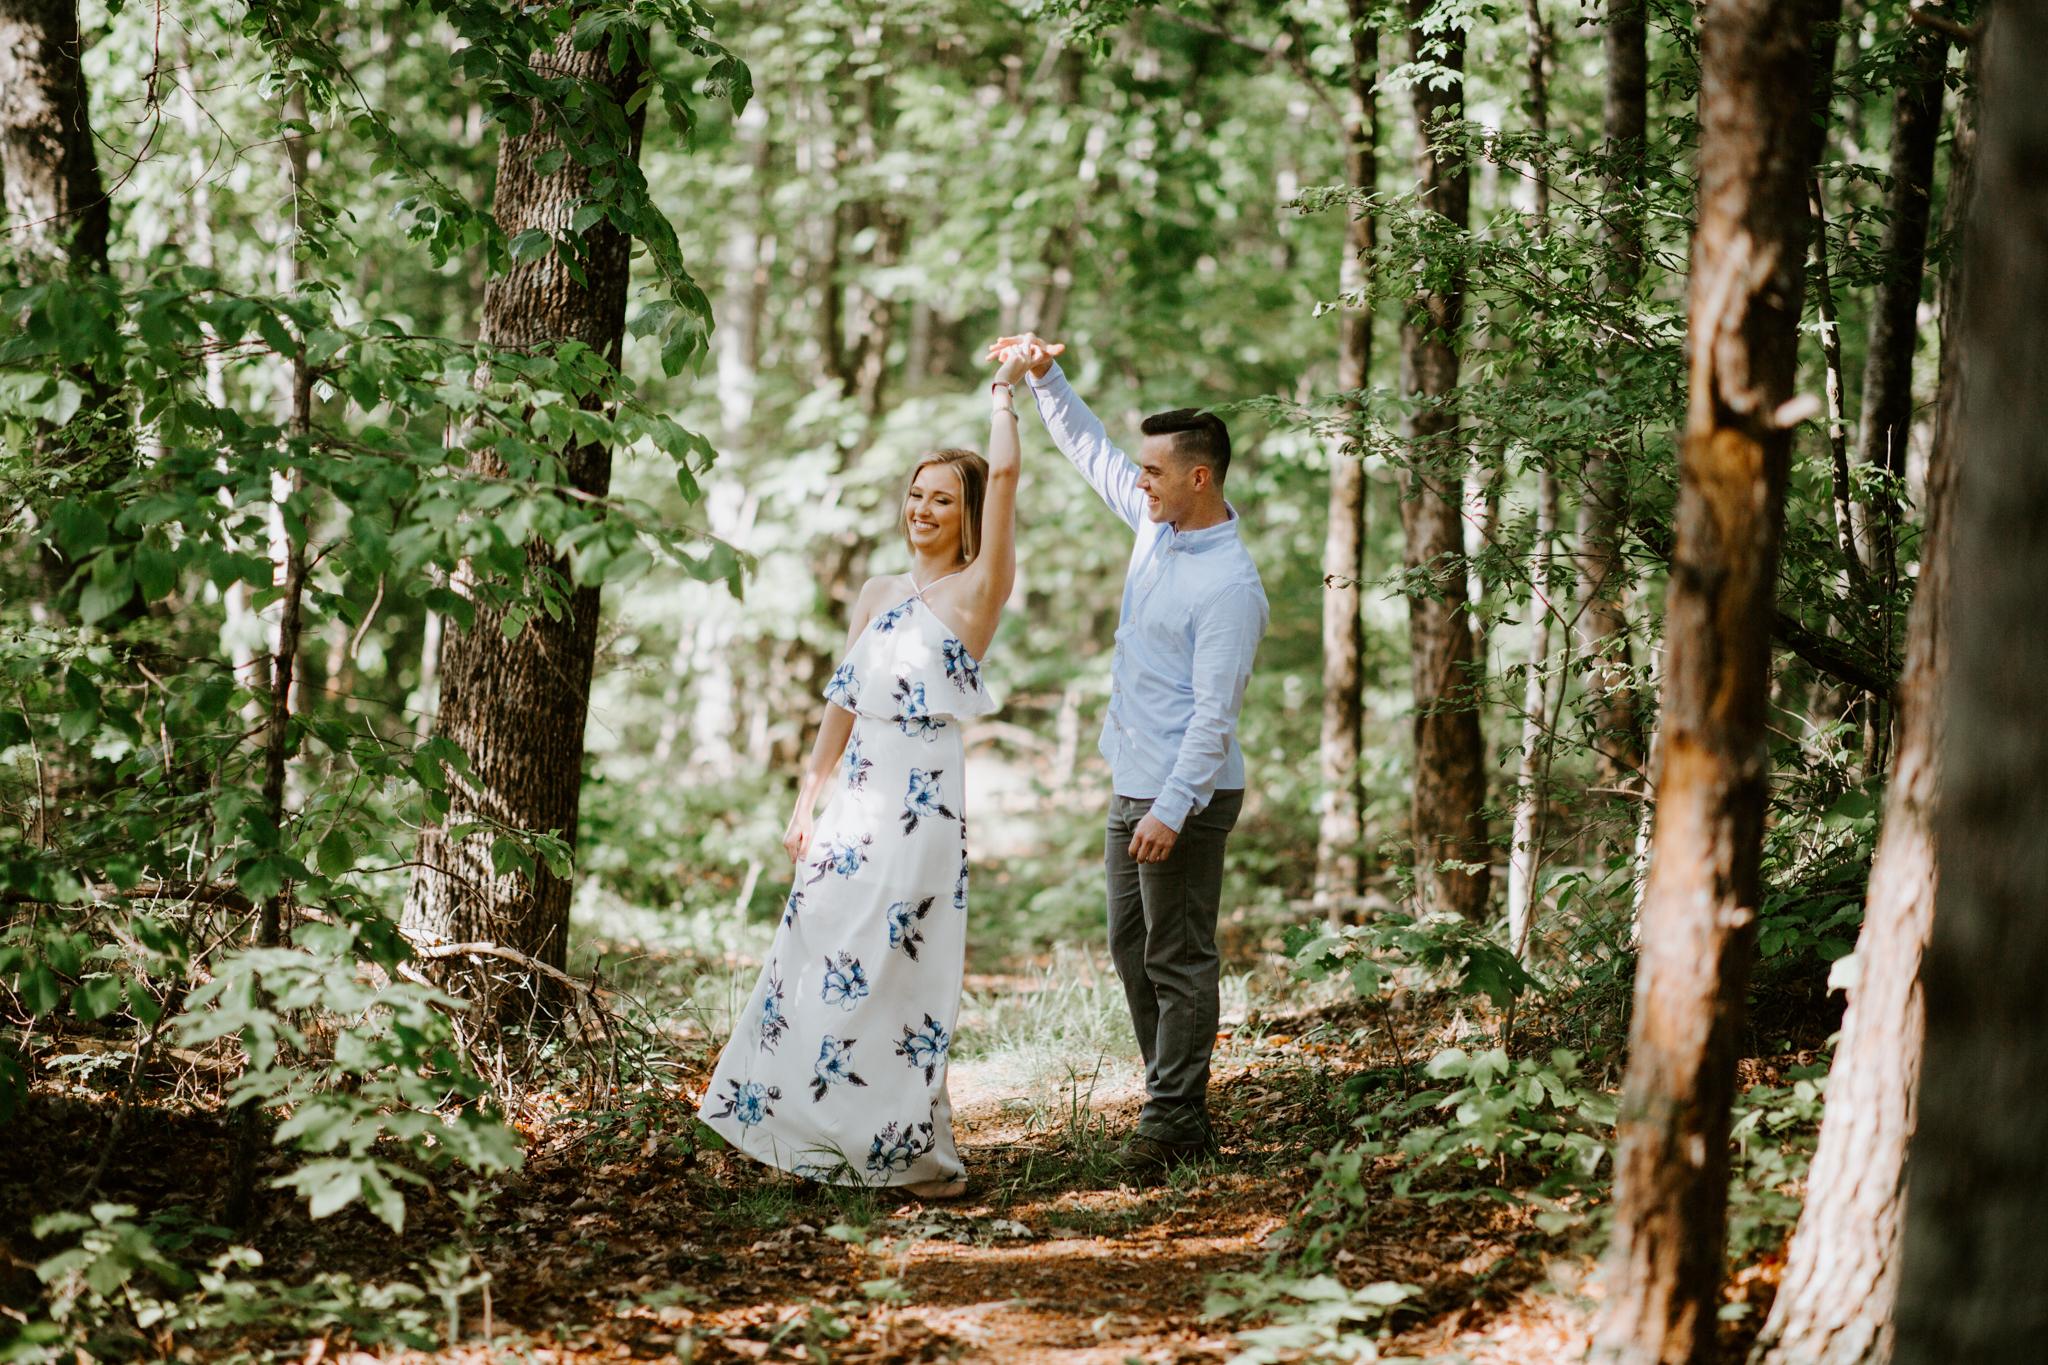 Courtney-Jordan-Chattanooga-Nashville-Tennessee-Wedding-Elopement-Photographer-24.jpg